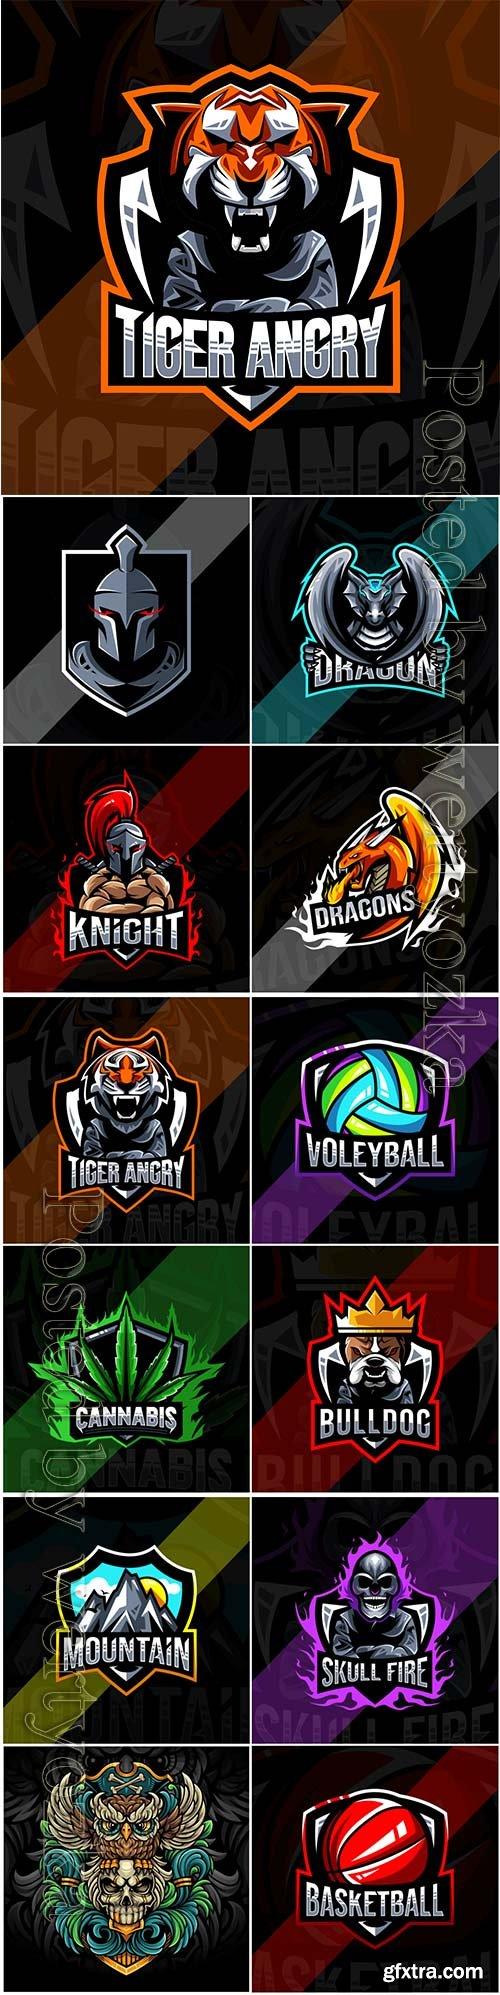 Mascot esport logo design premium vector vol 32